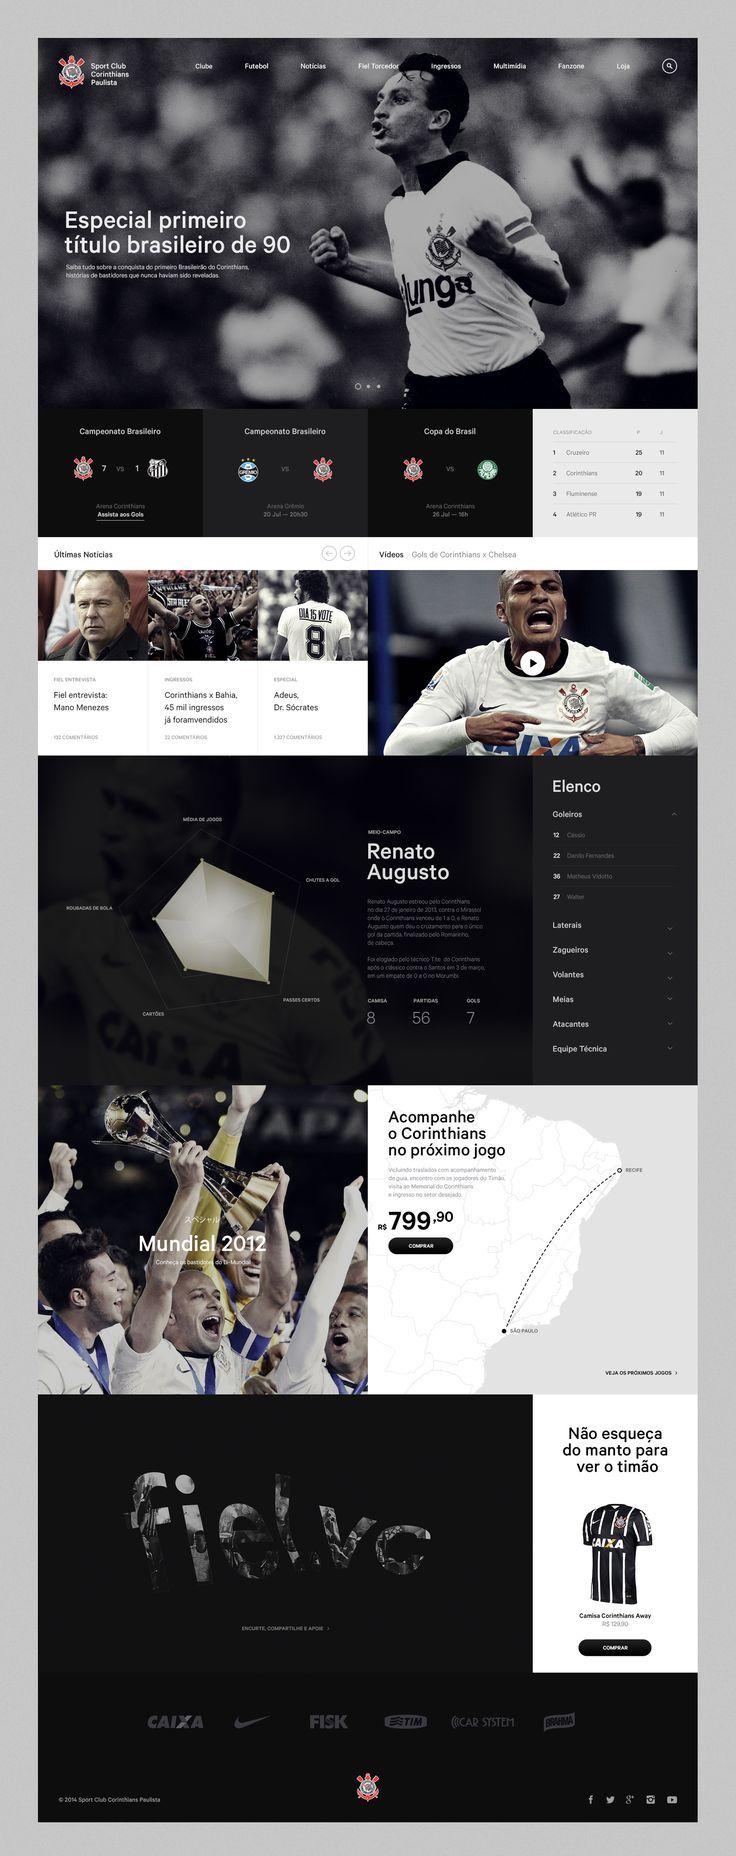 Corinthians Danilo Campos — Designer & Art Director. The